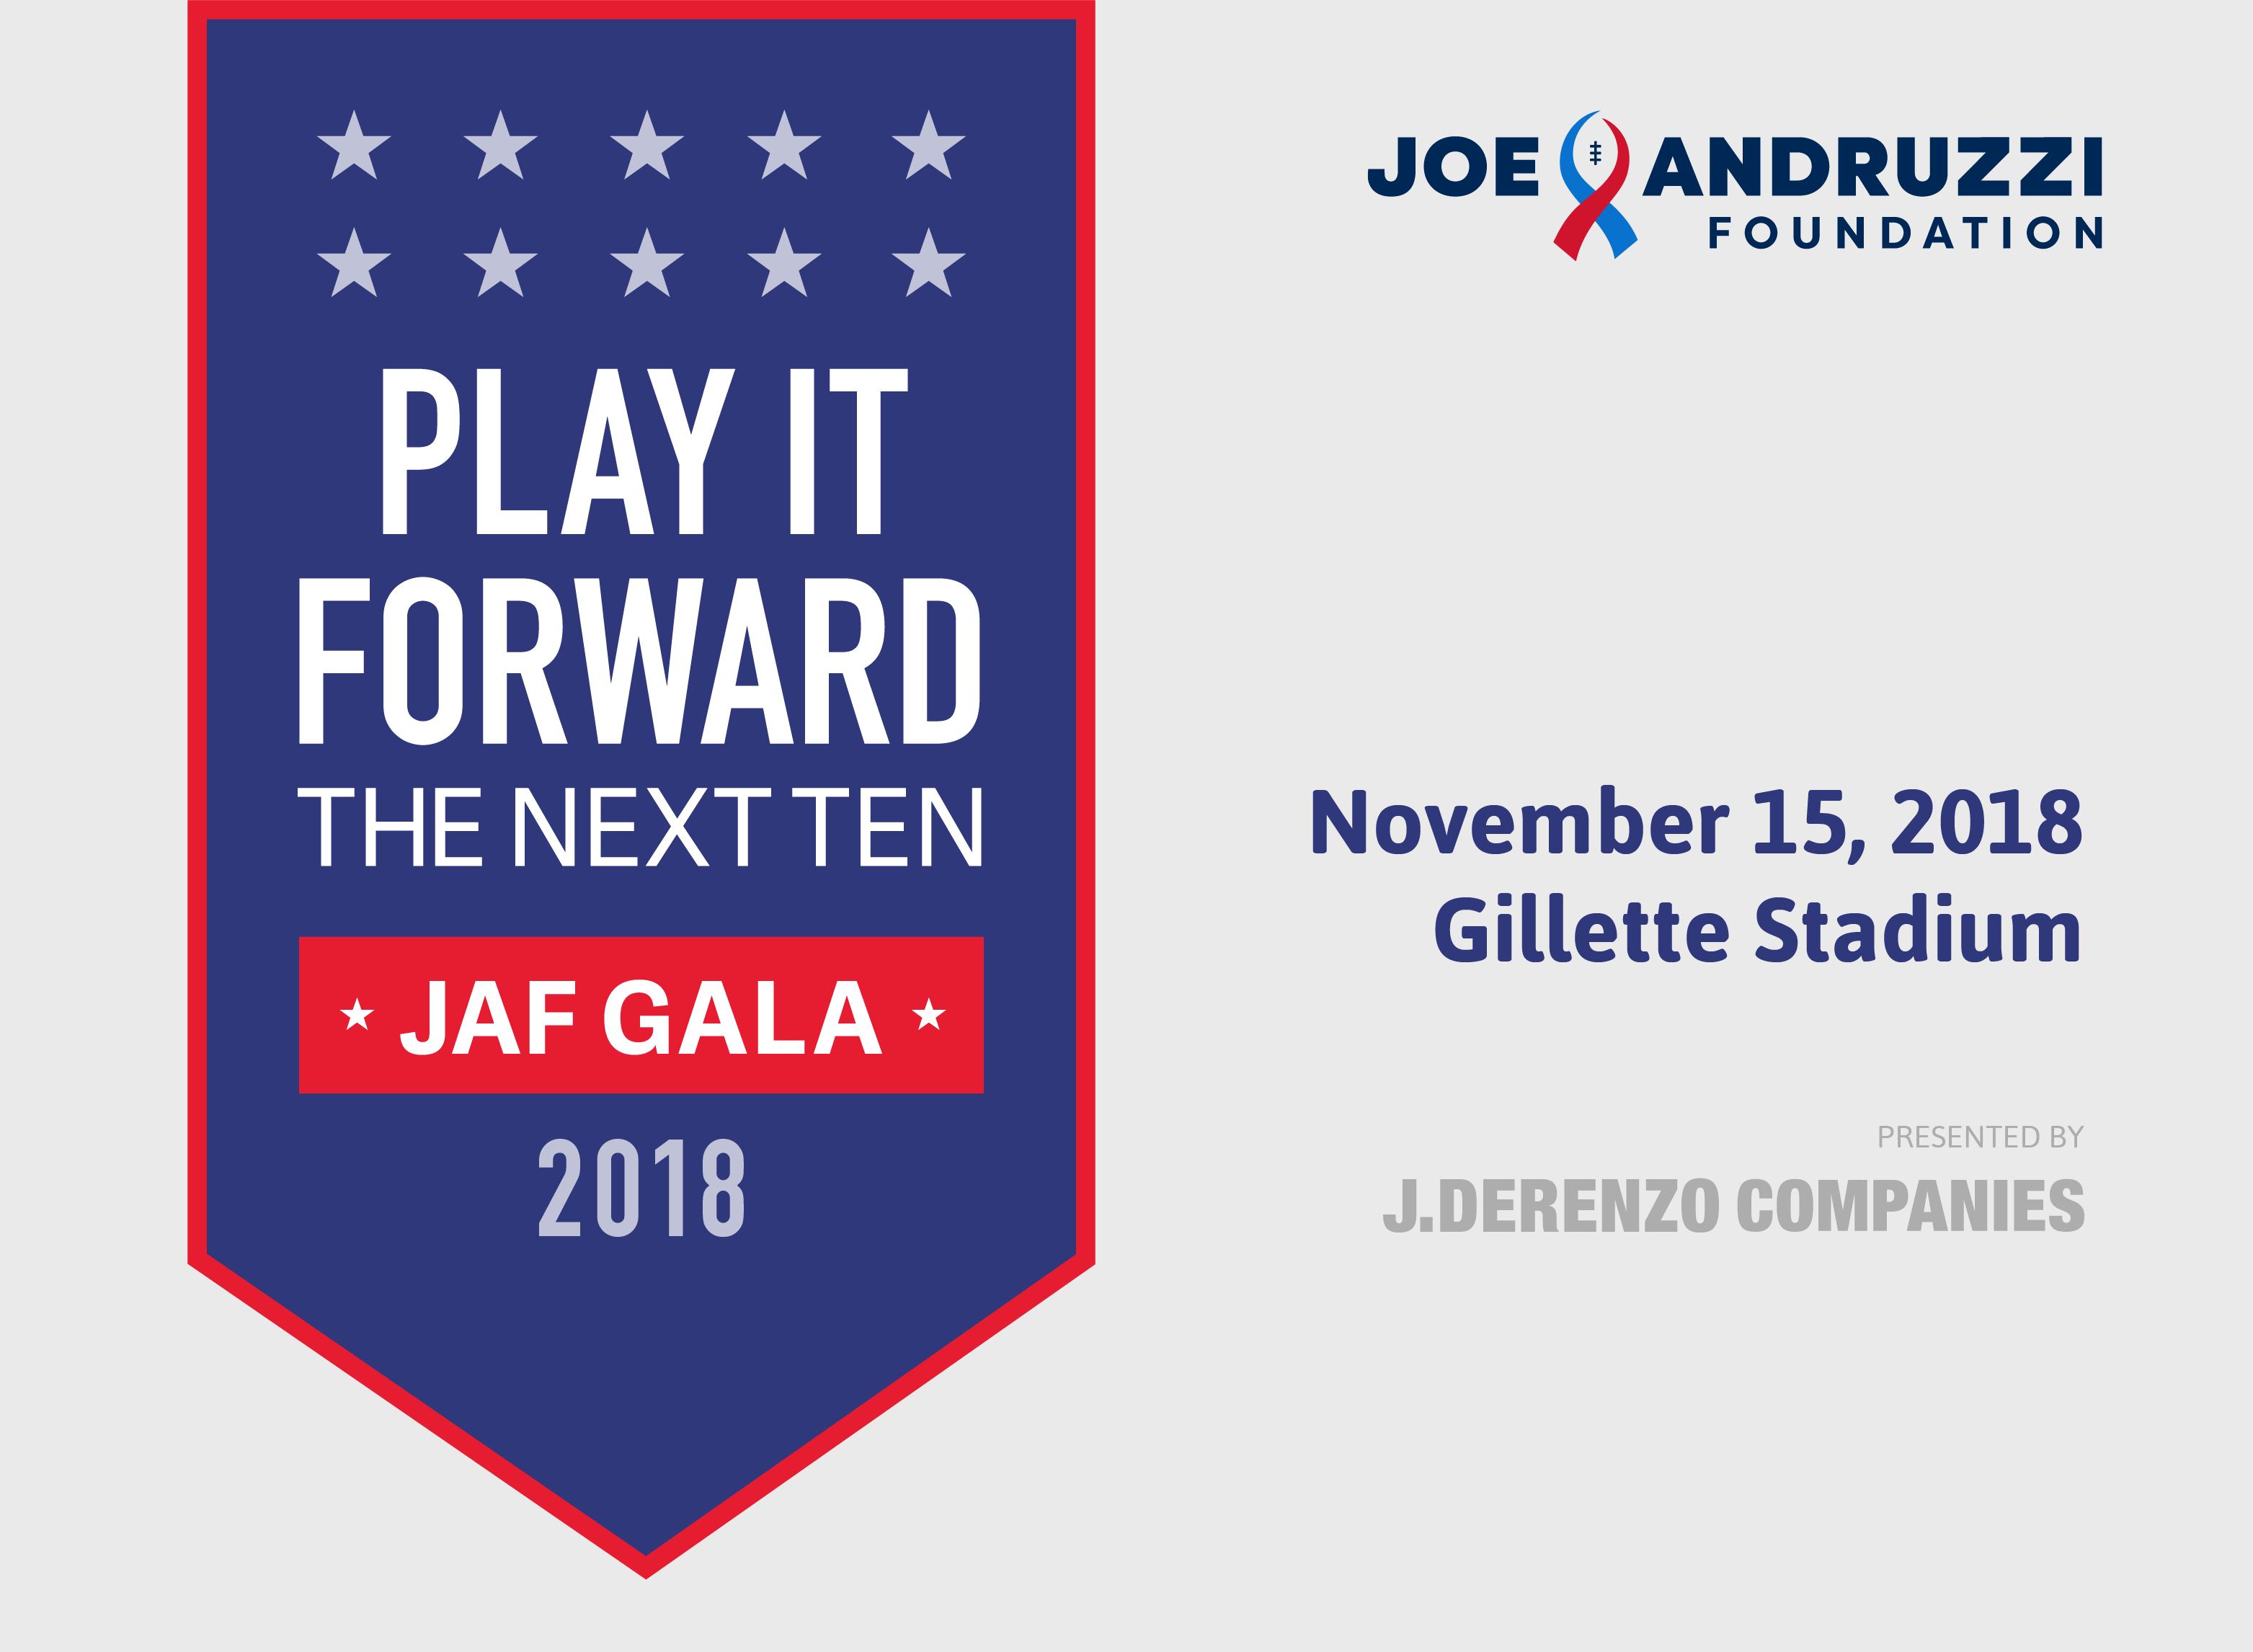 JAF Gala 2018_Web Banners_750x550